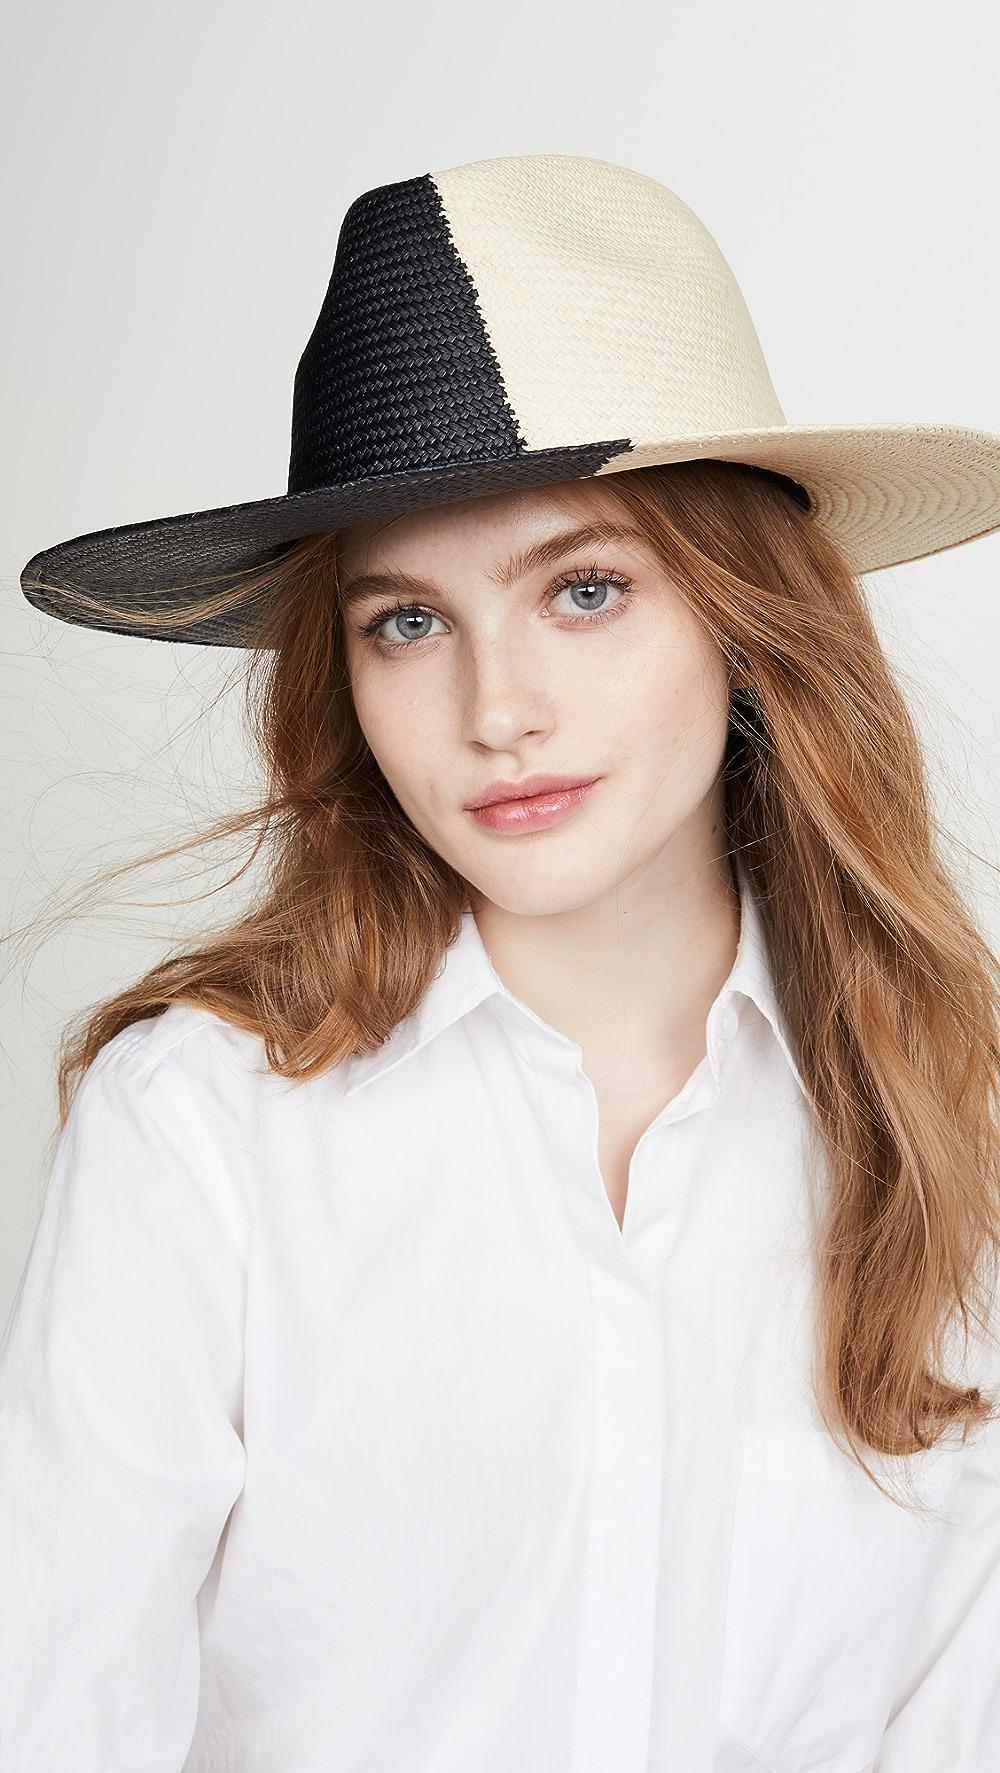 Dedicated Freya - The Shadow Hat Year-End Bargain Sale